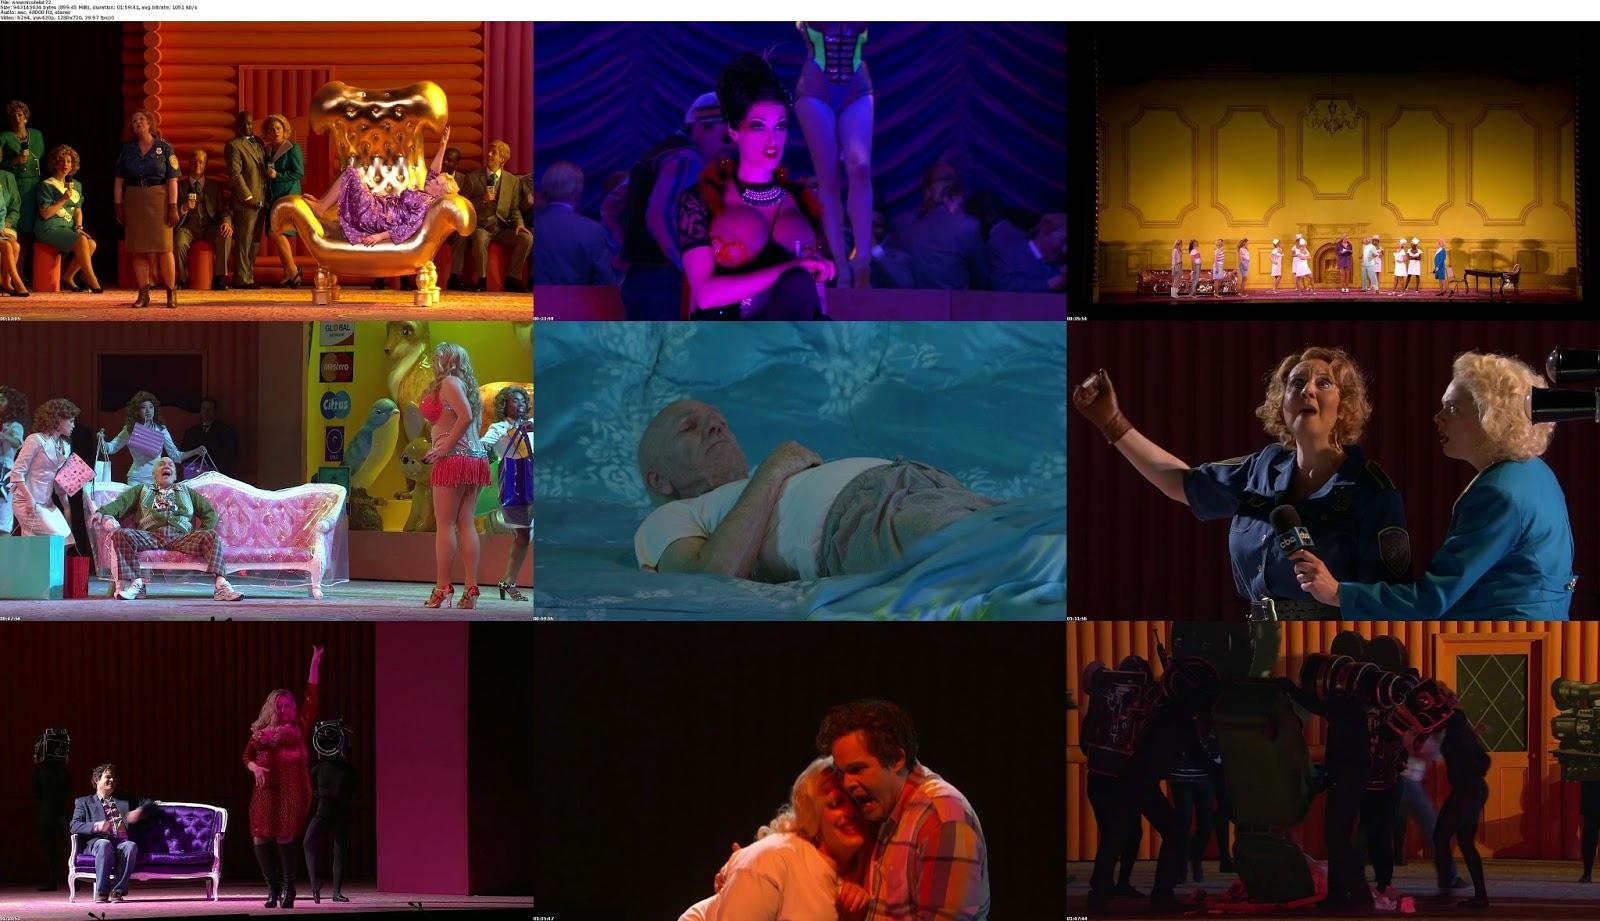 http://4.bp.blogspot.com/-uGKQ0mZcCCw/UVZQ8PdRRaI/AAAAAAAATLc/a5HXsq-I2qE/s1600/Anna+Nicole+(2011)+BluRay+720p+BRRip+900MB+Hnmovies.jpg